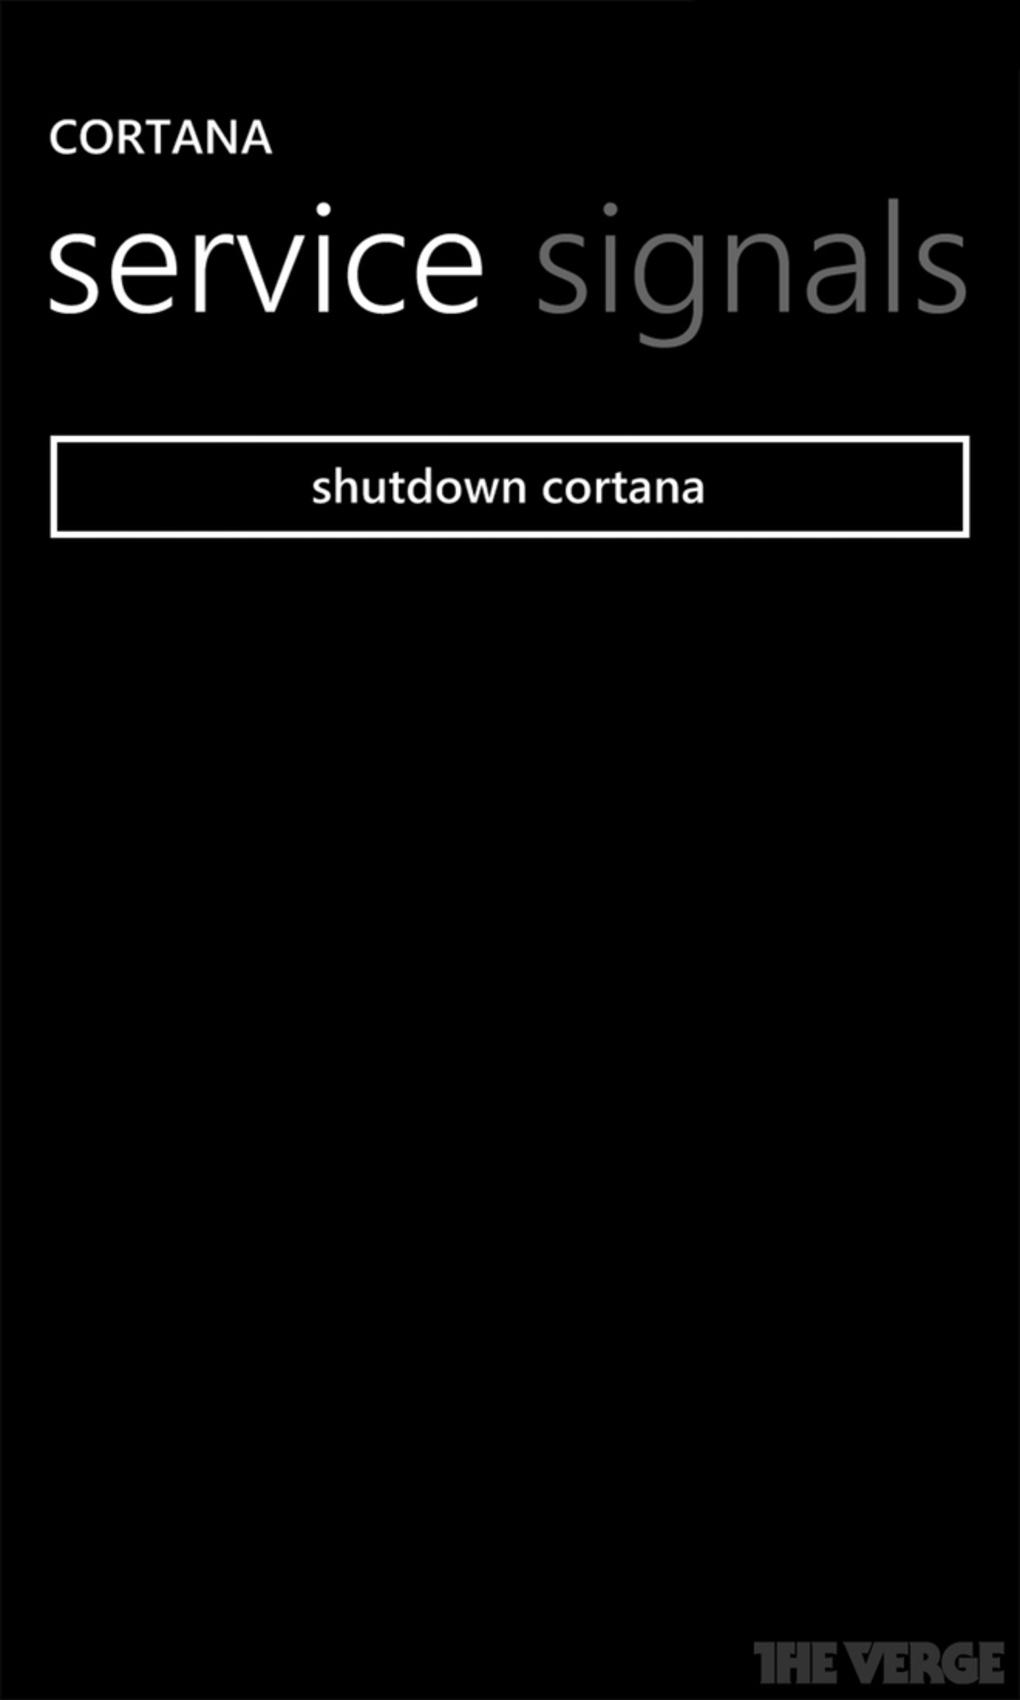 cortanascreenshots6_1020_verge_super_wide